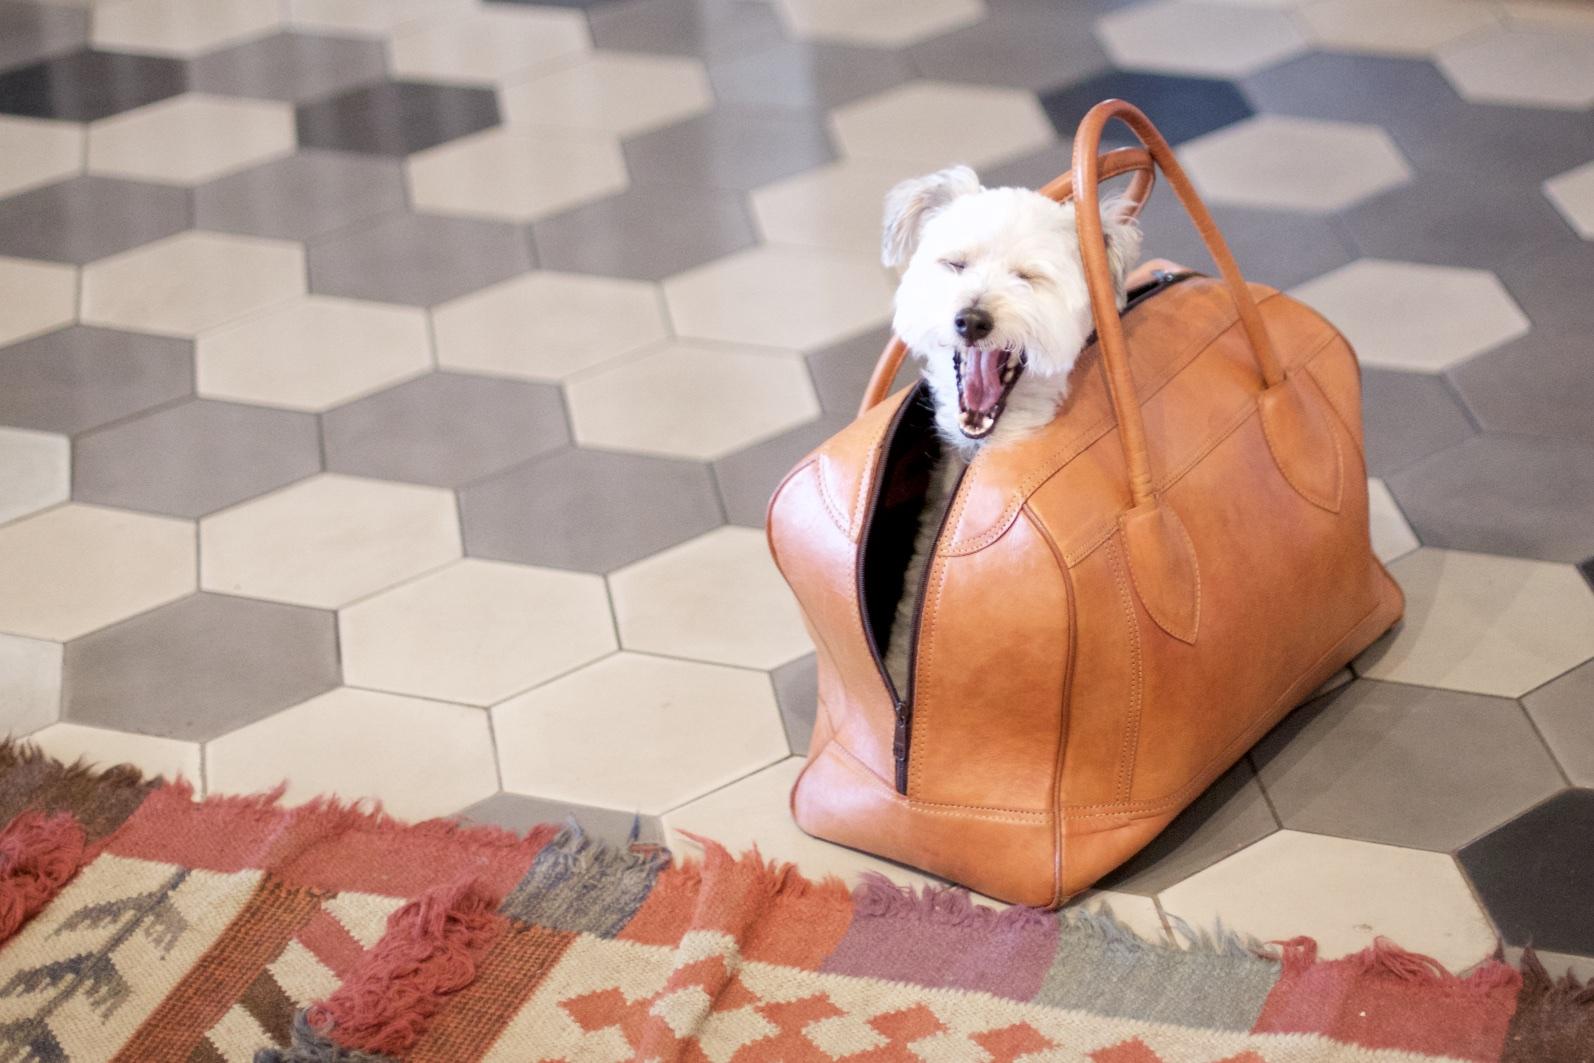 stef-etow-kimpton-dog-4.jpg